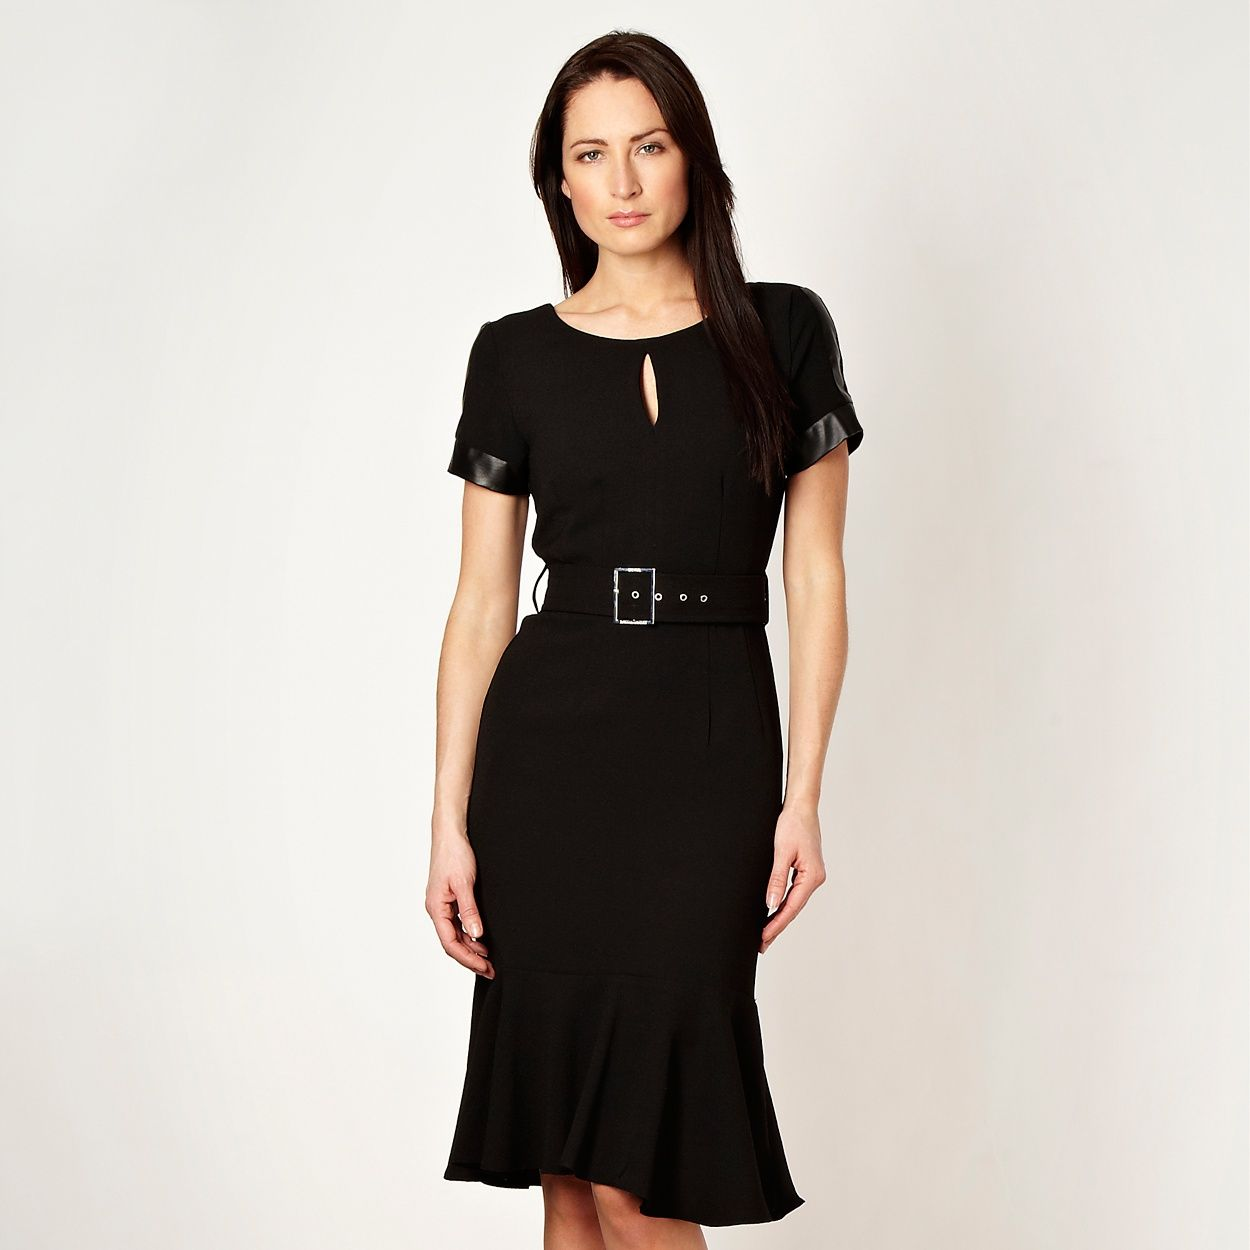 03447f39931f Star by Julien MacDonald Designer black faux leather panelled work dress-  at Debenhams.com